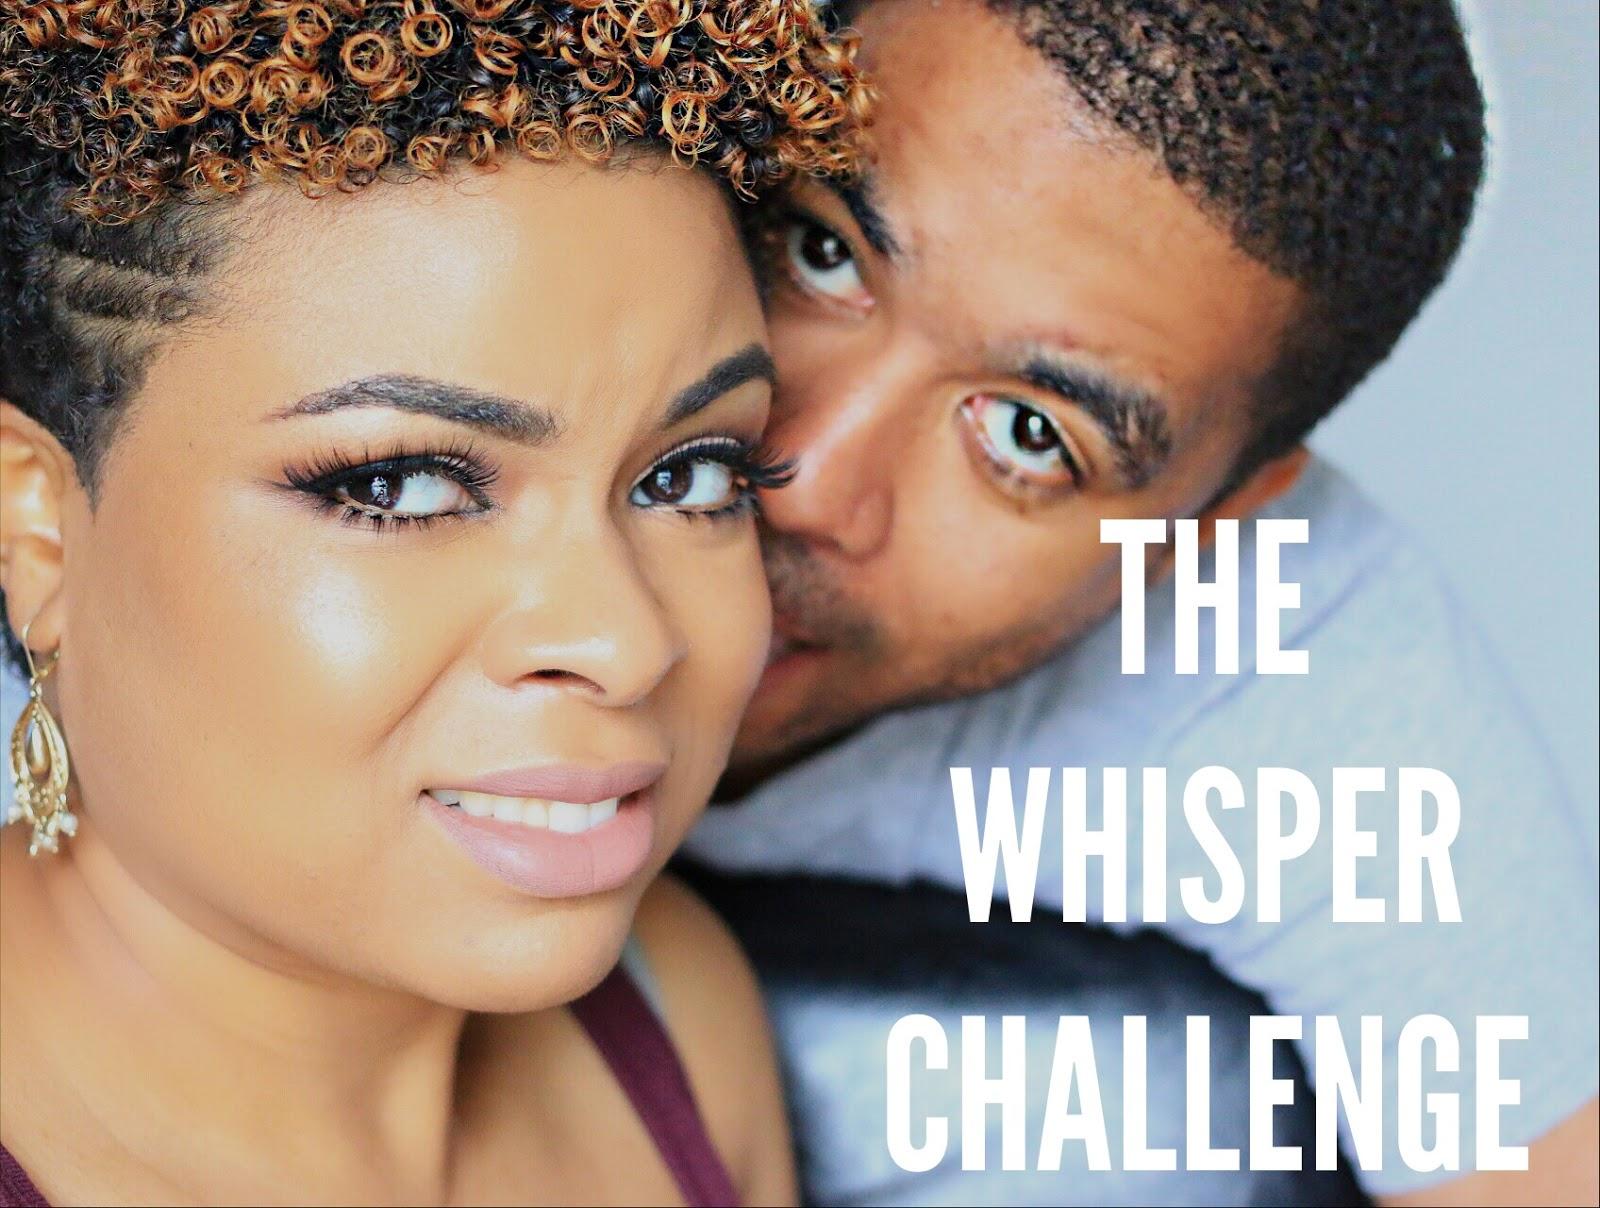 Natural Hair Rebel | The Whisper Challenge | www.naturalhairrebel.com